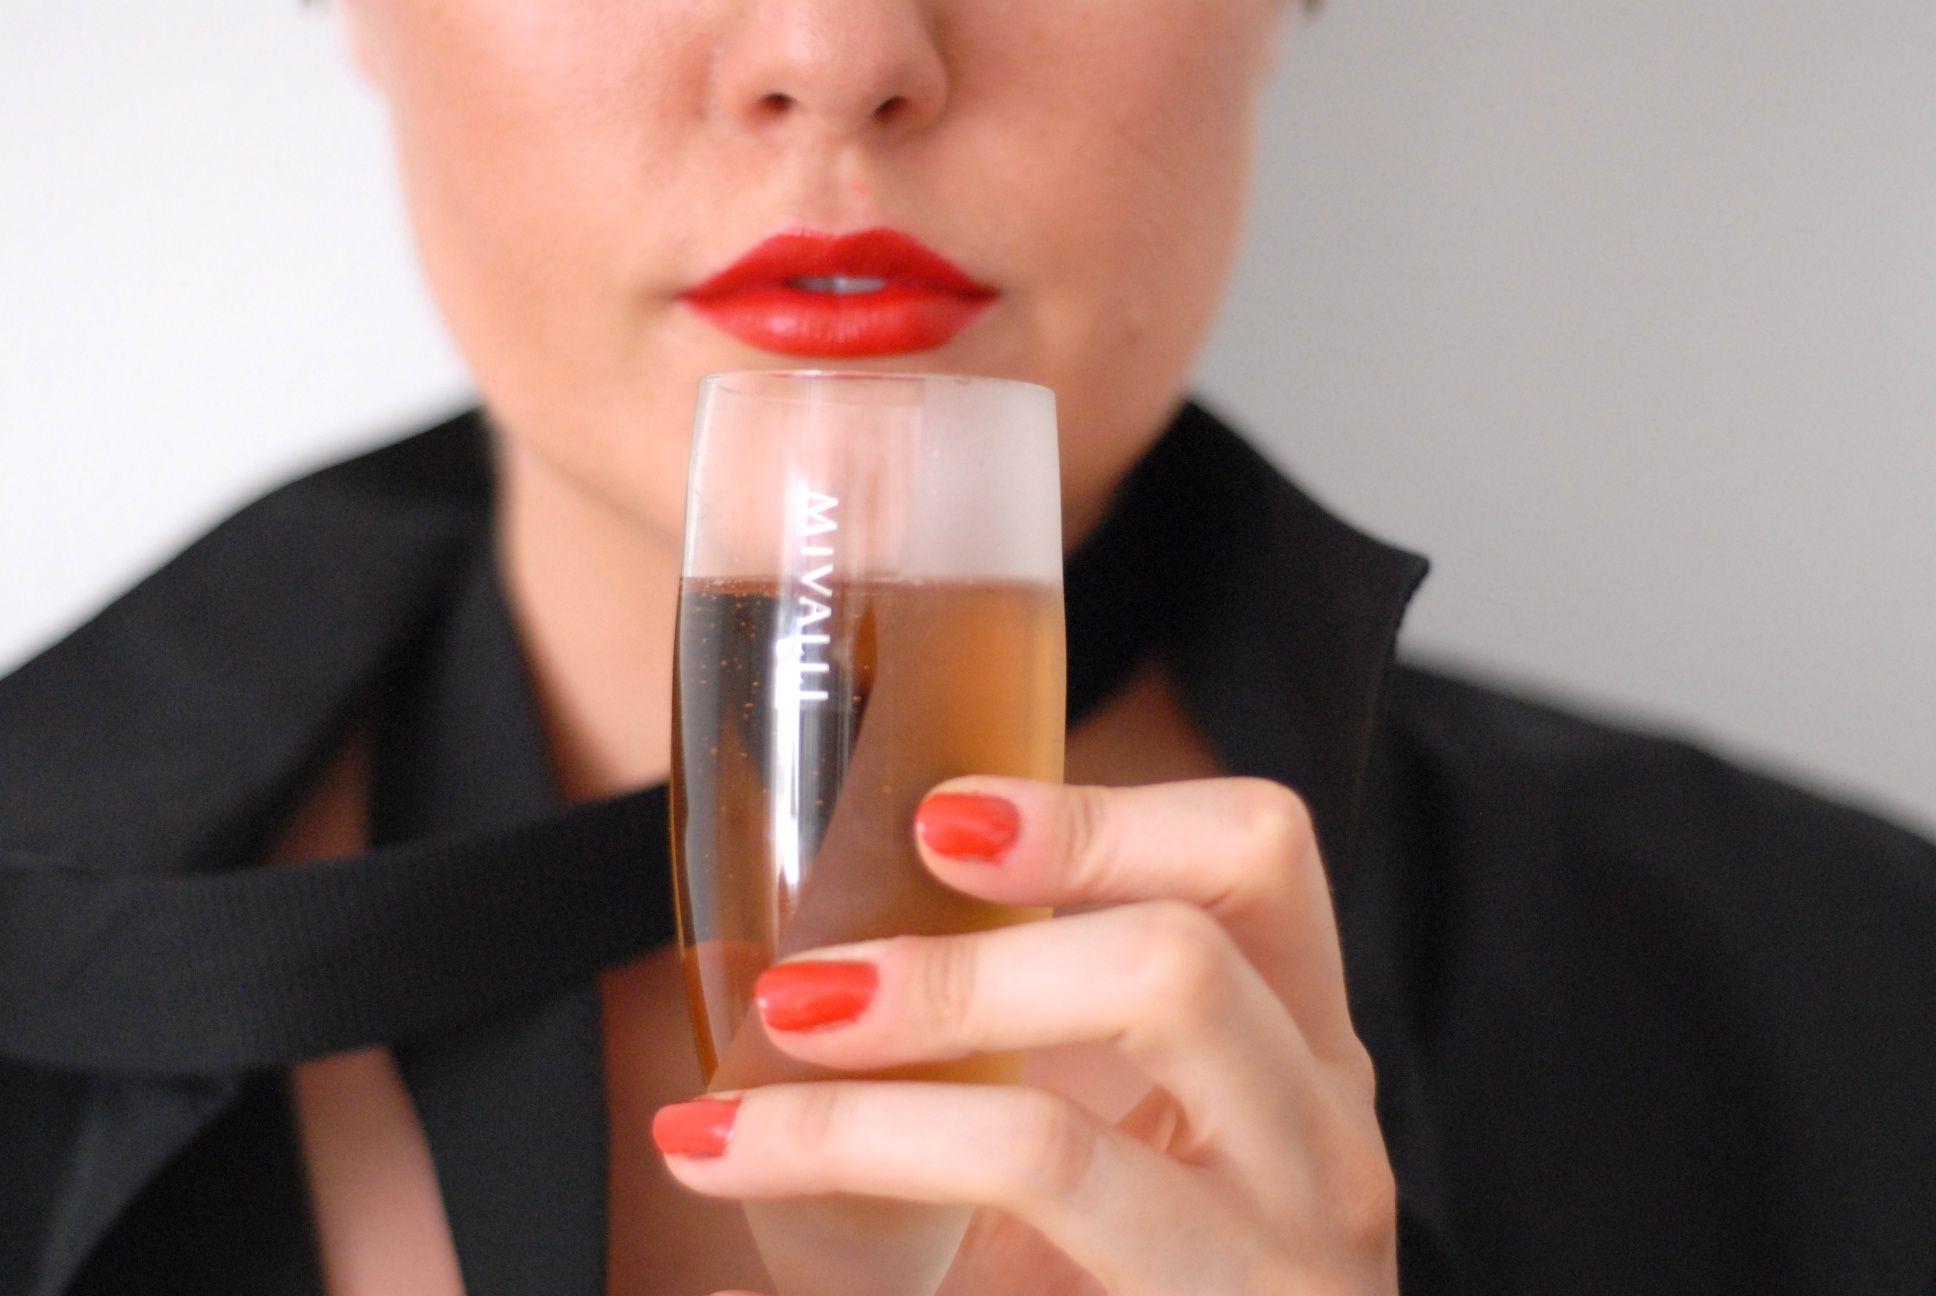 #MD #mivalli #suomalainenmuotoilu #sisustus #homedecor #elegance #wineglass #candleholder #finnishdesign #nordicdesign